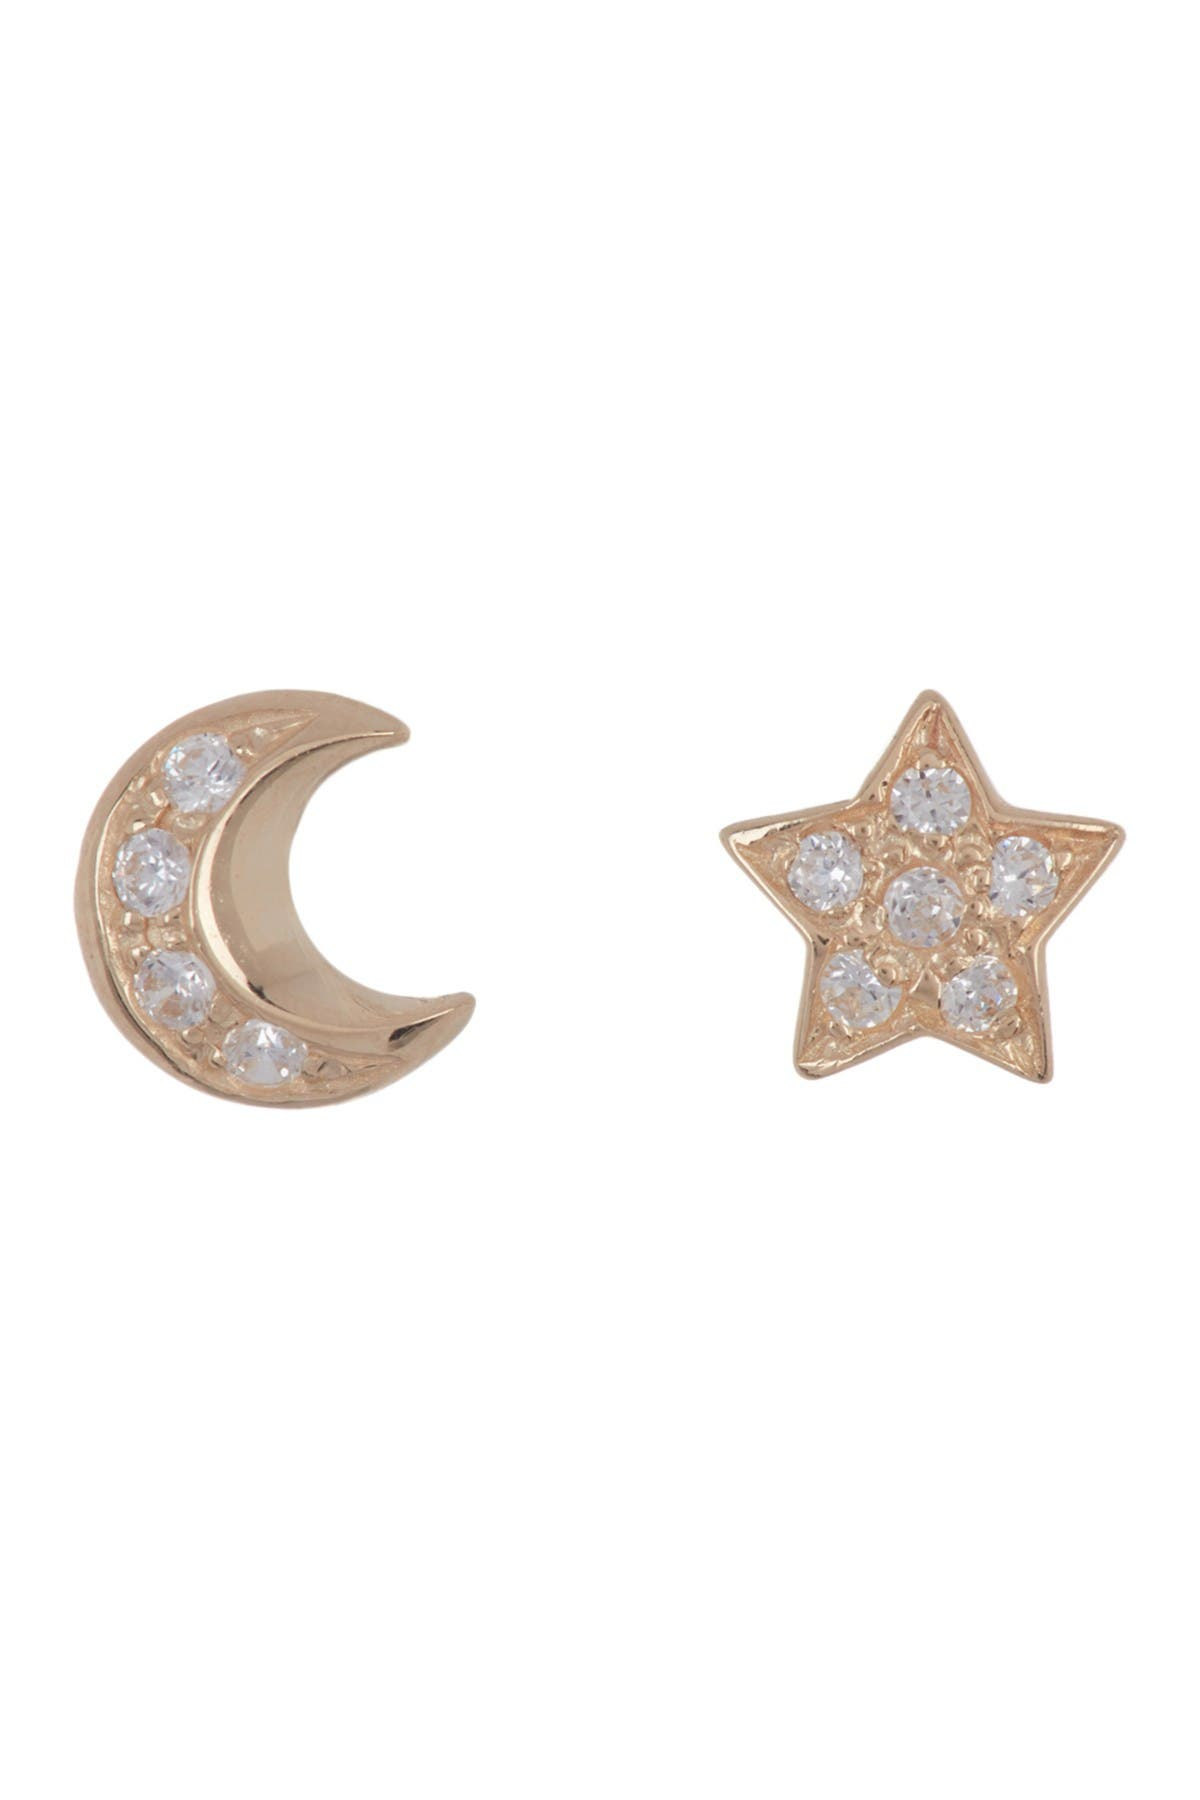 Image of Candela 14K Yellow Gold CZ Star & Moon Stud Earrings